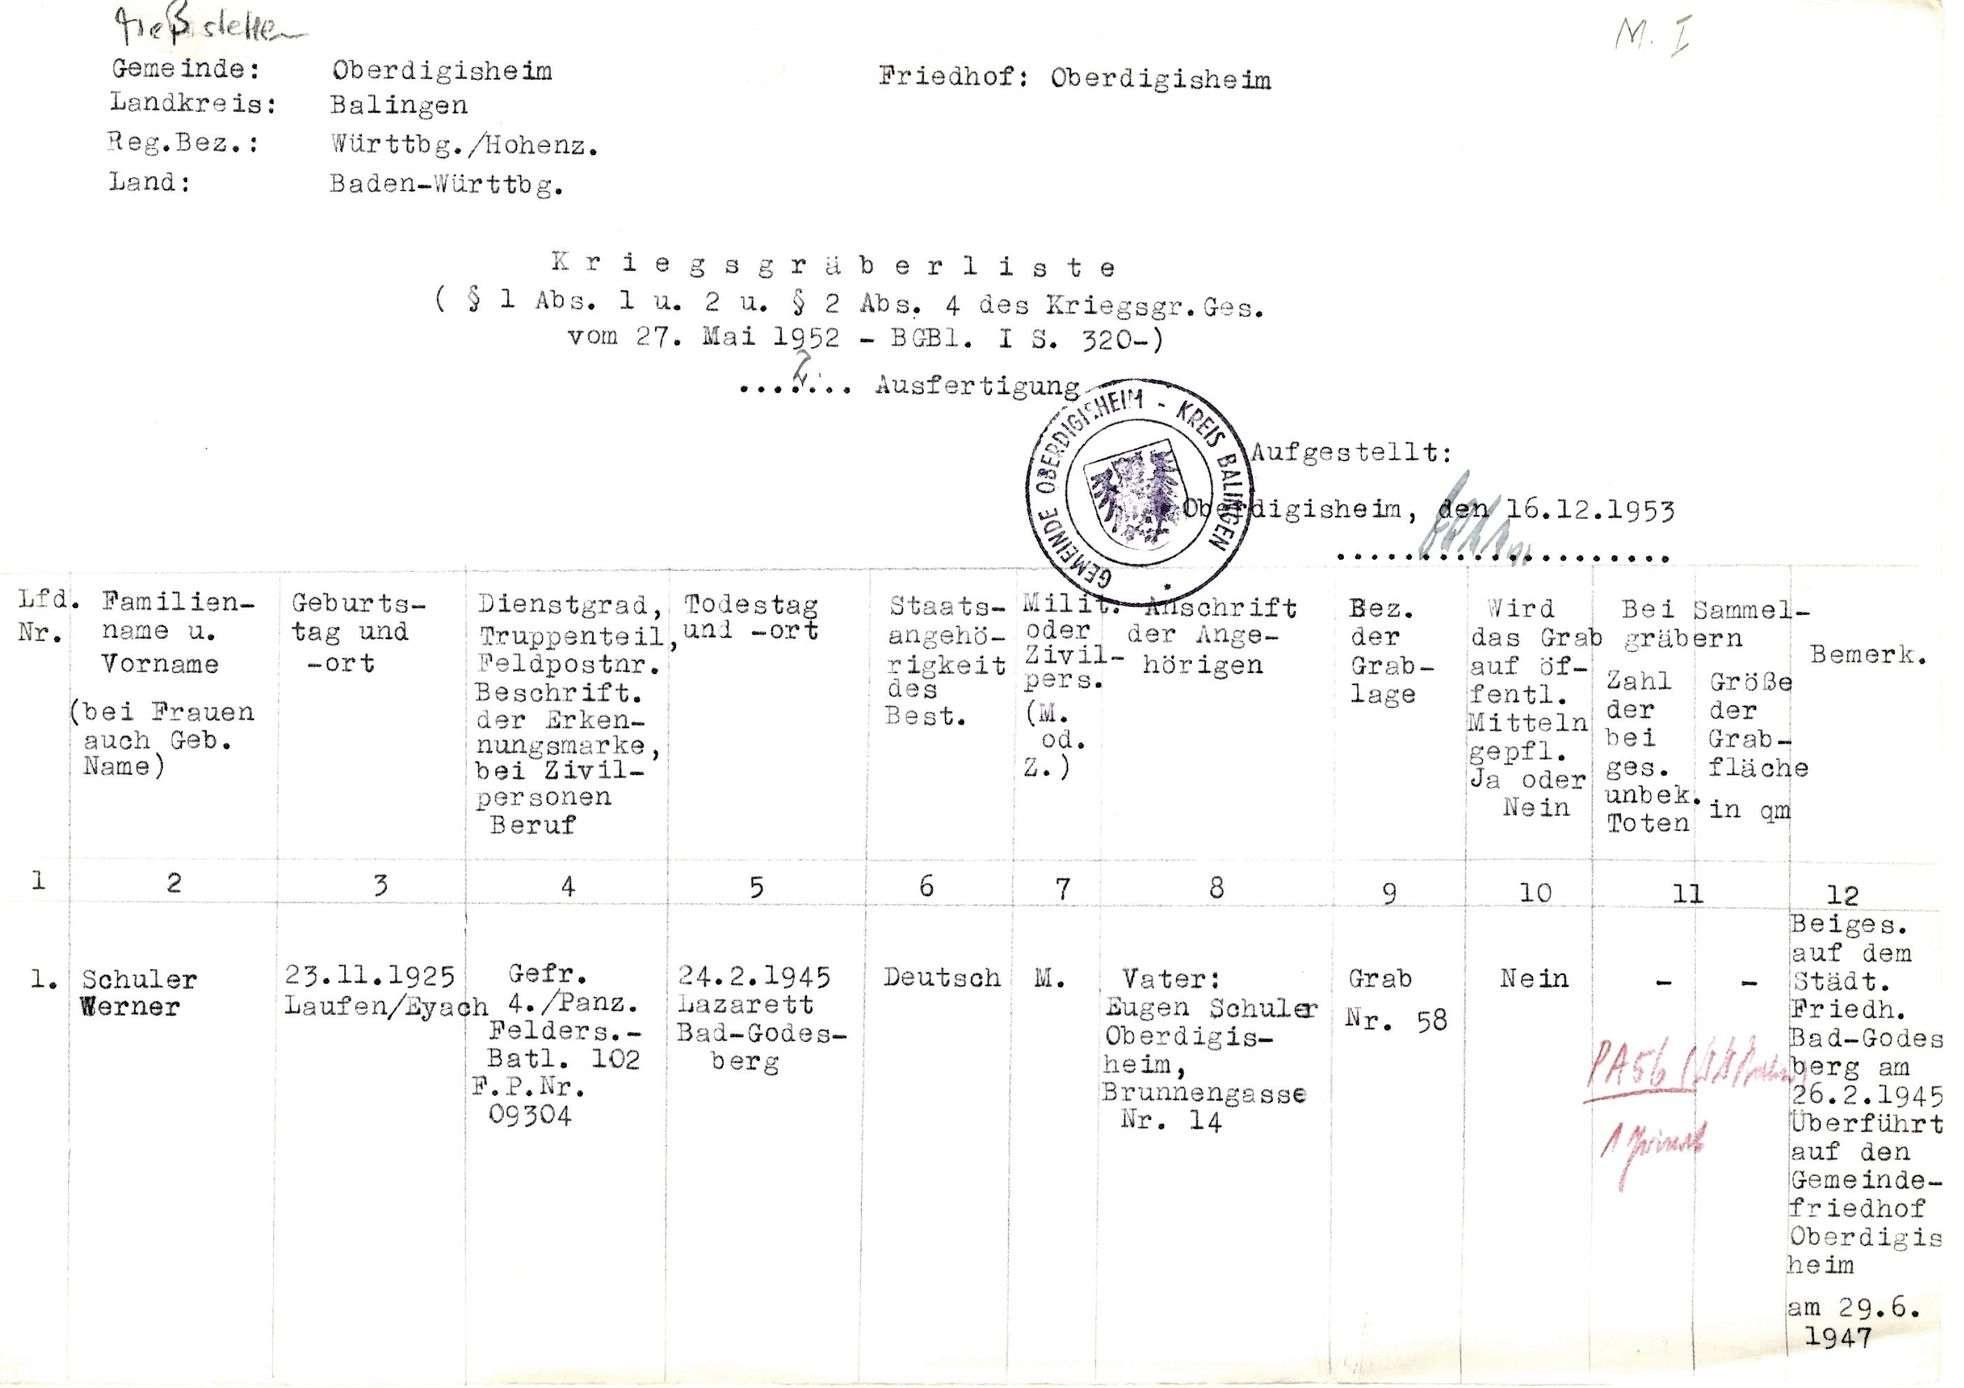 Oberdigisheim, Bild 1